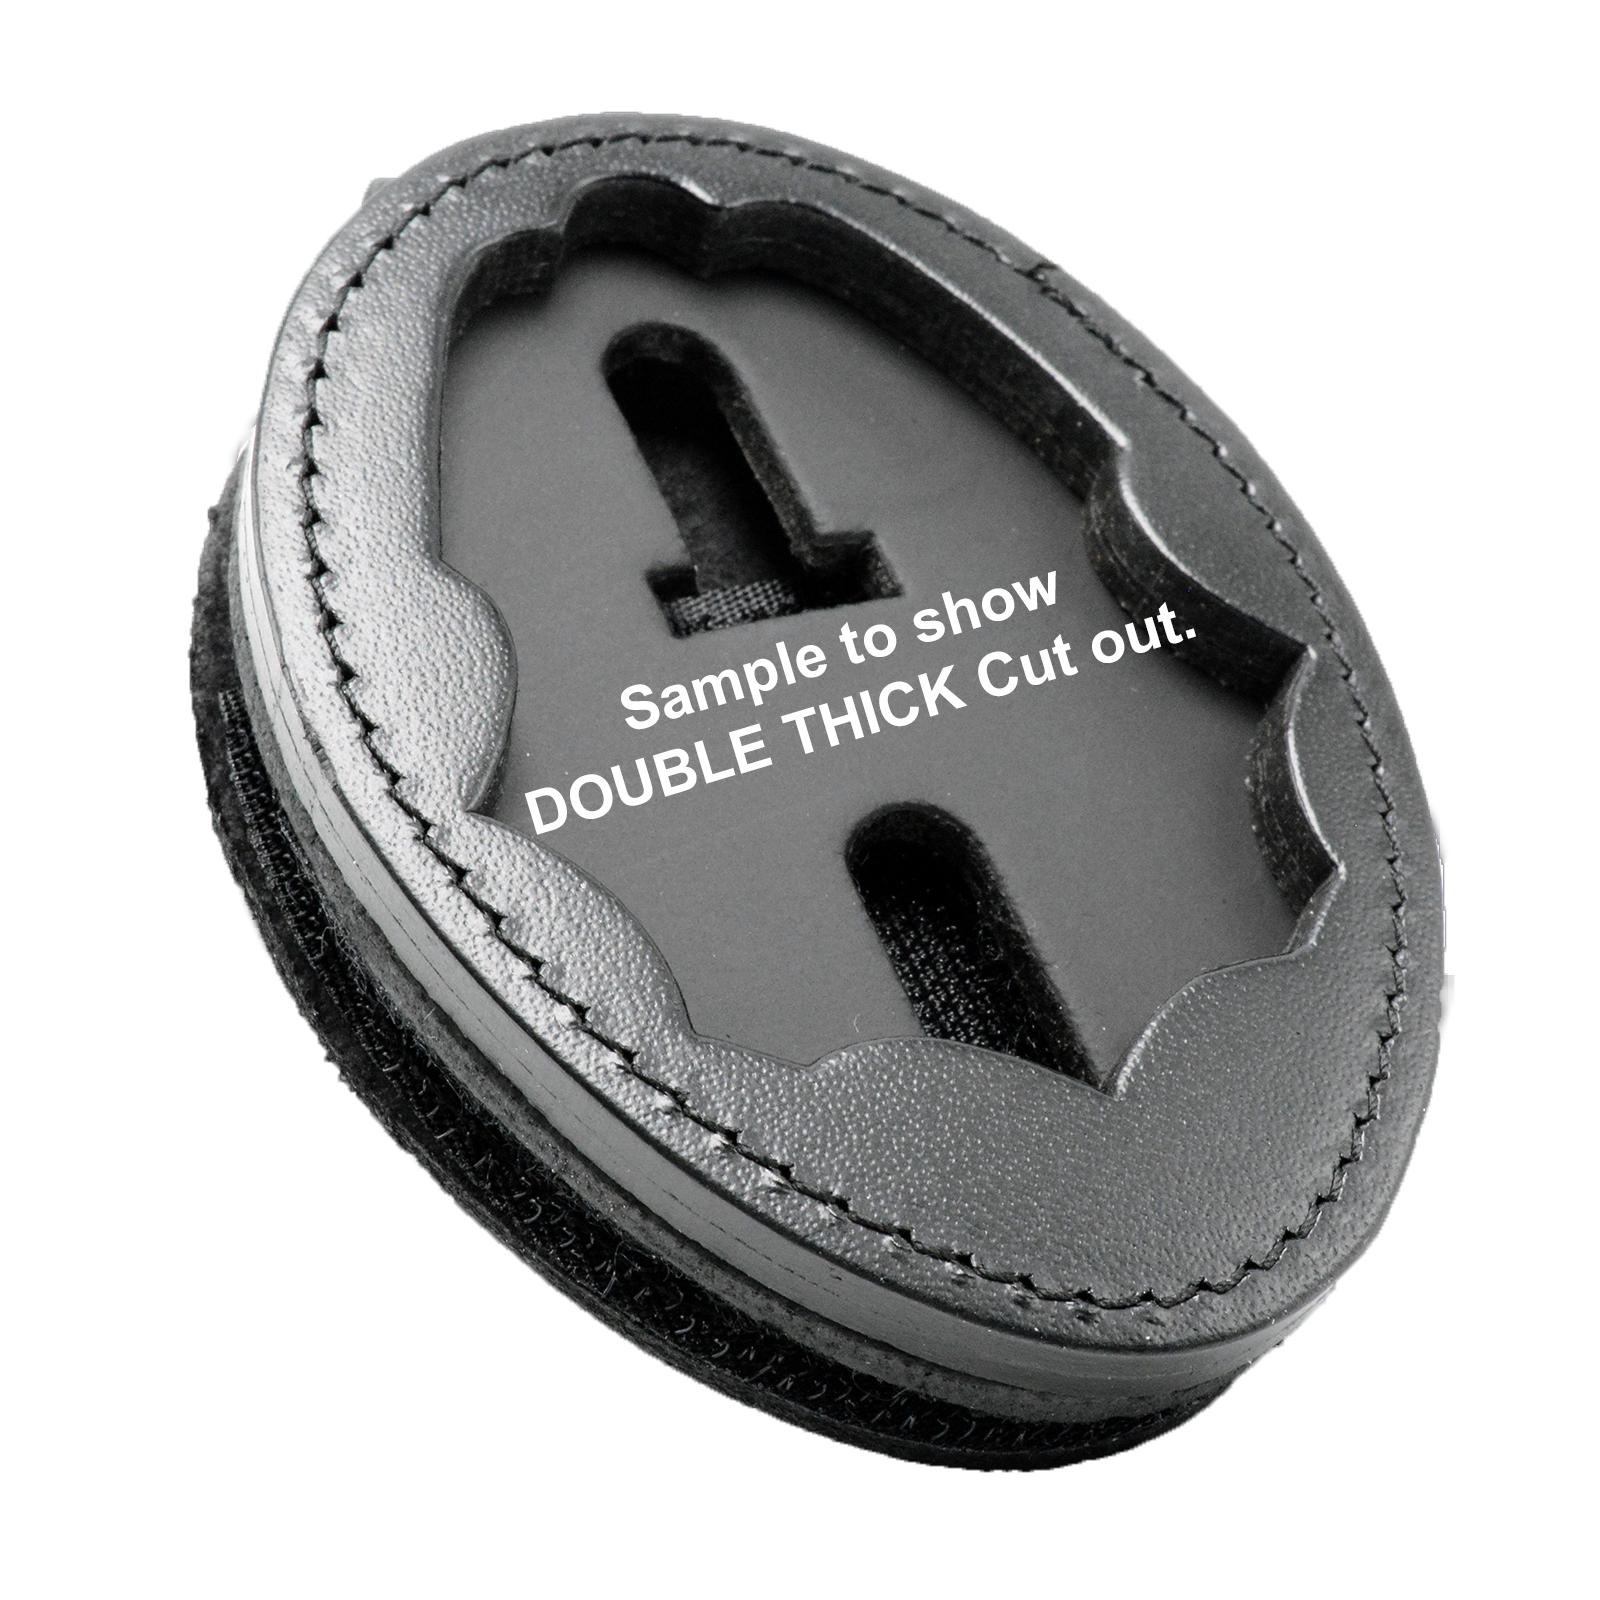 double-thick-cutout-belt-clip-badge-holder.jpg